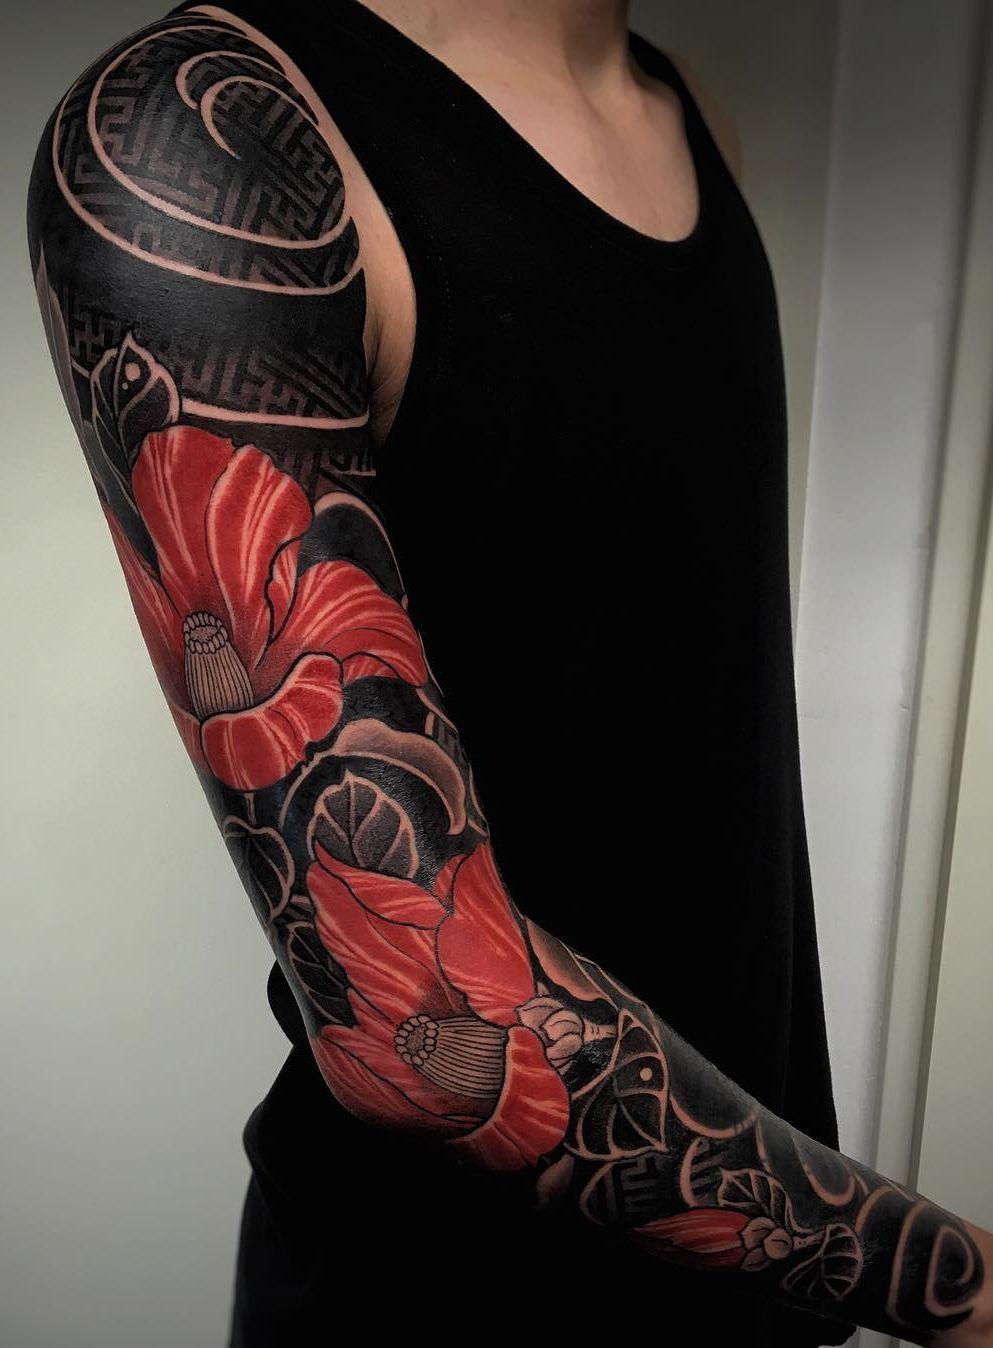 Blackout Tattoo Ideas C Tattoo Artist G A K K I N Manga Japonesa Tatuaje Tatuajes Japoneses Tatuajes Japoneses Brazo